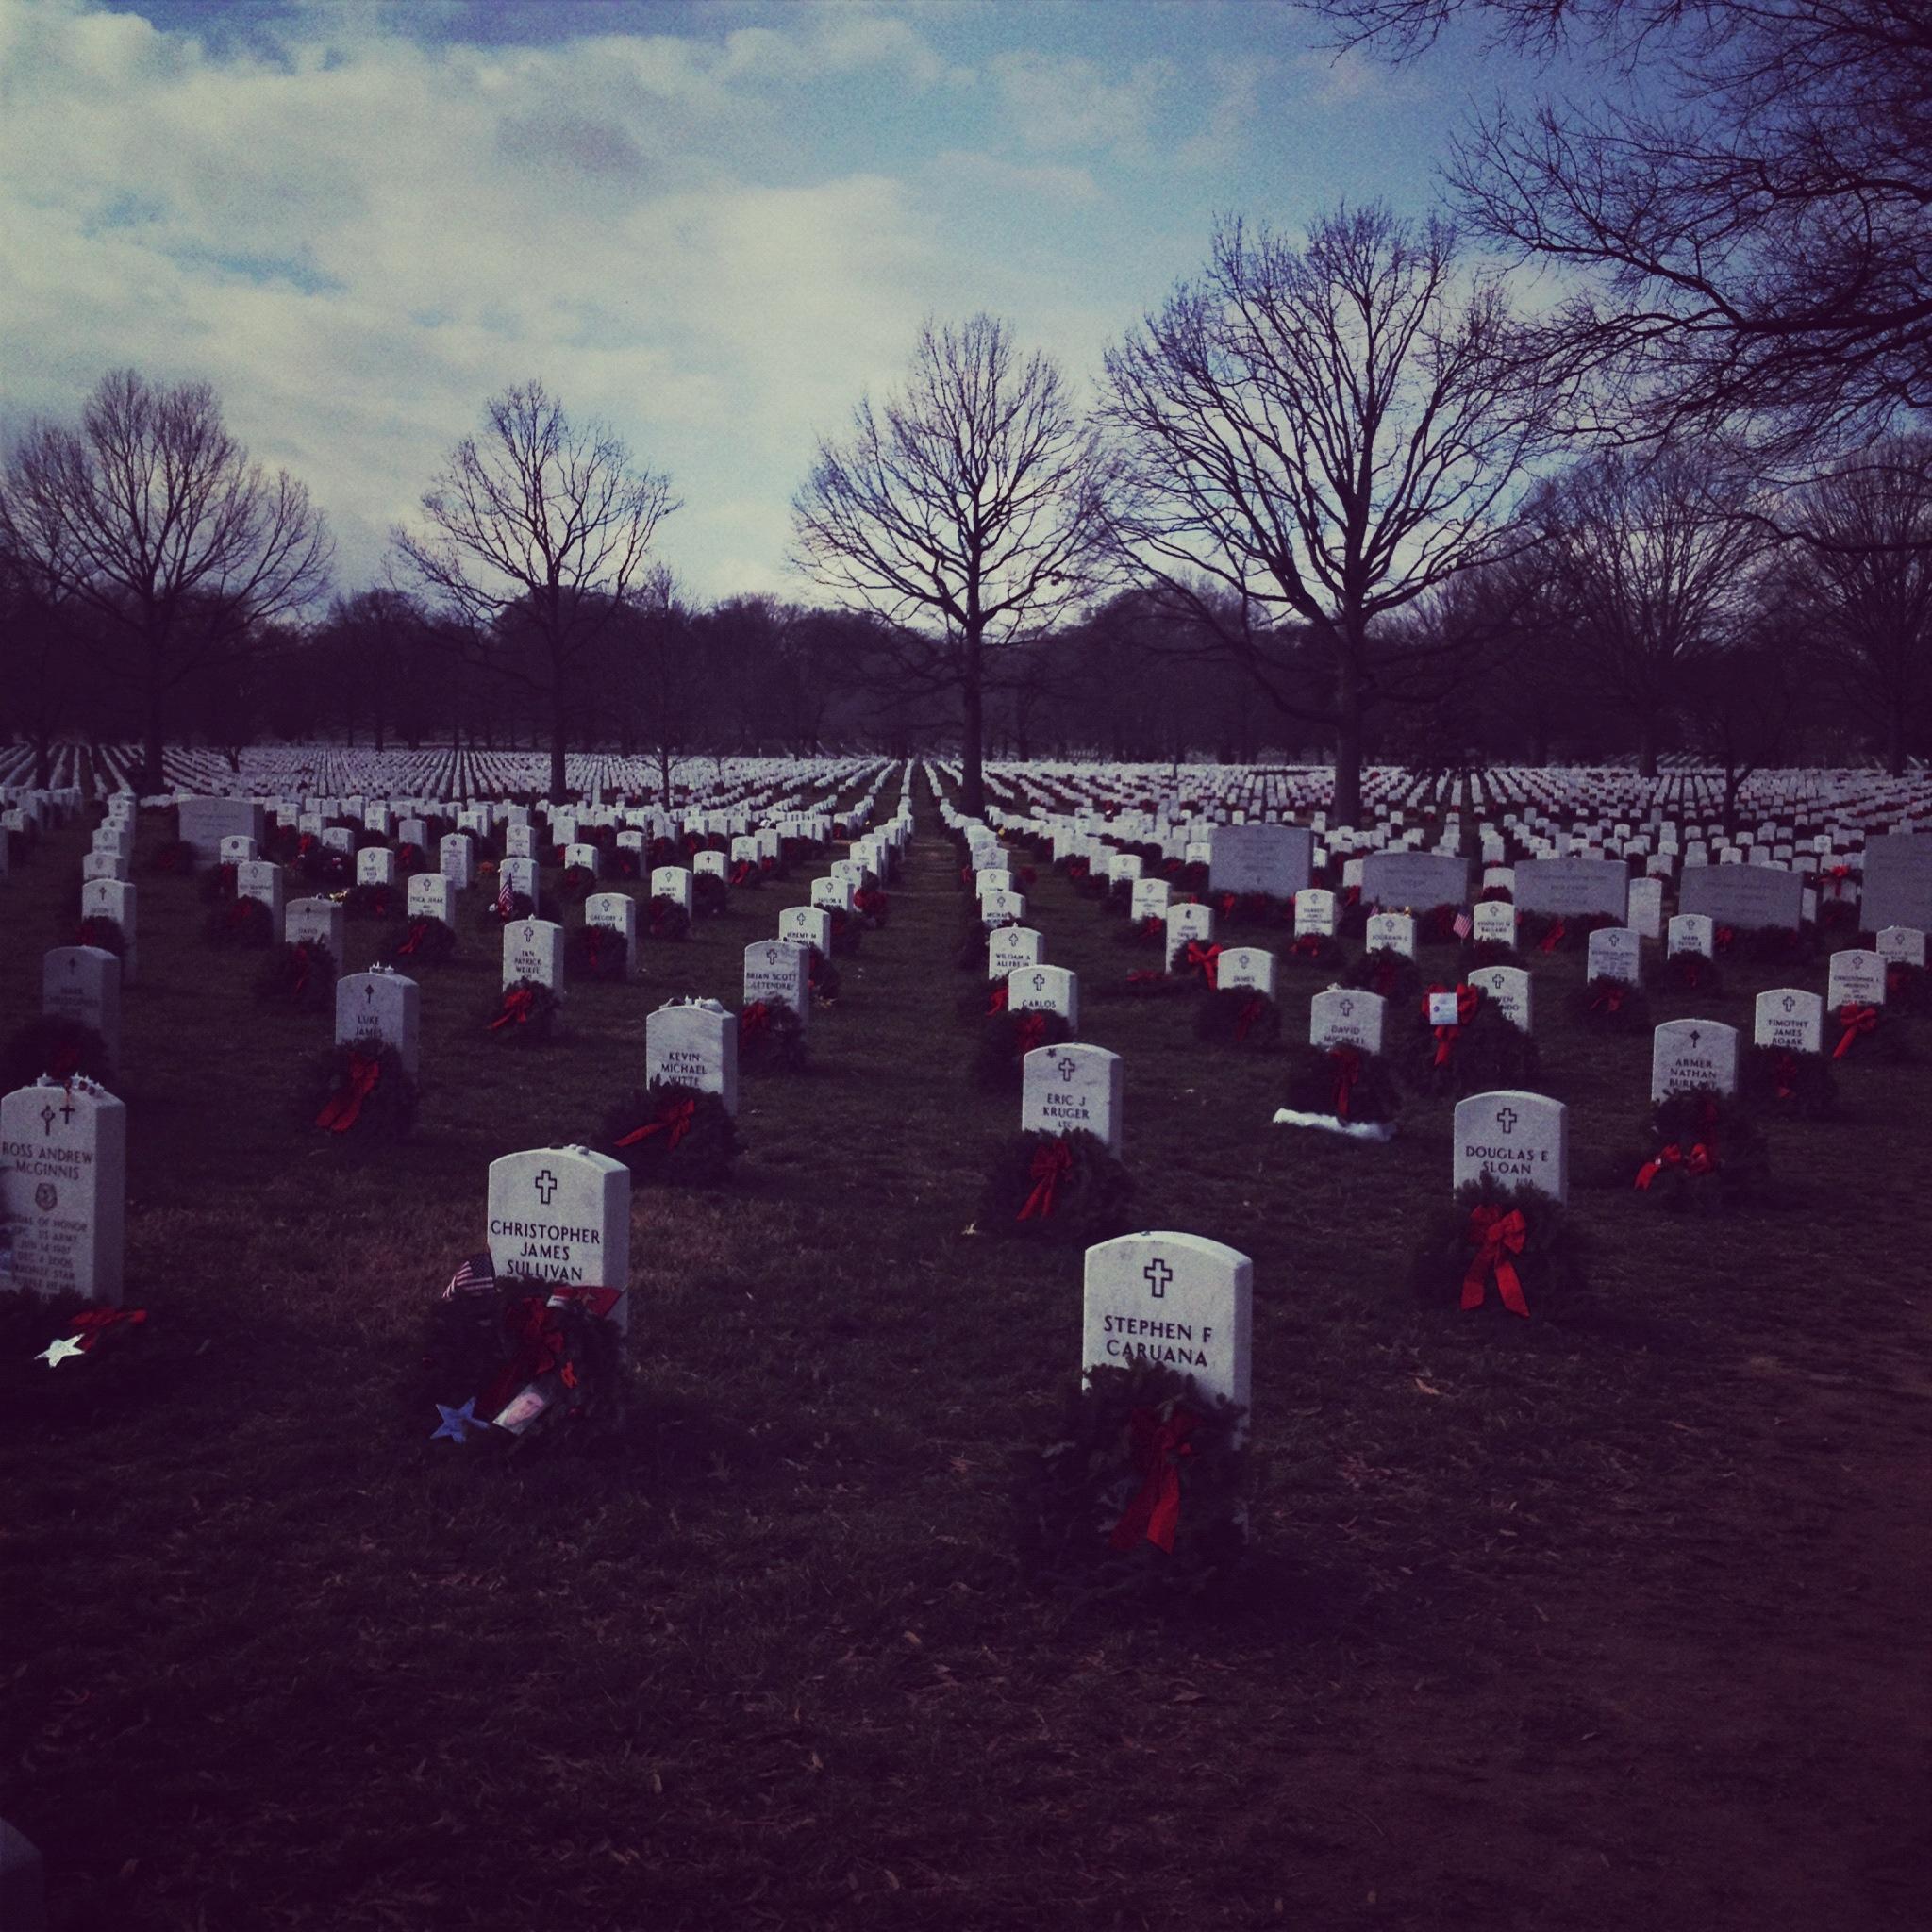 Remembrance via TheELD.com